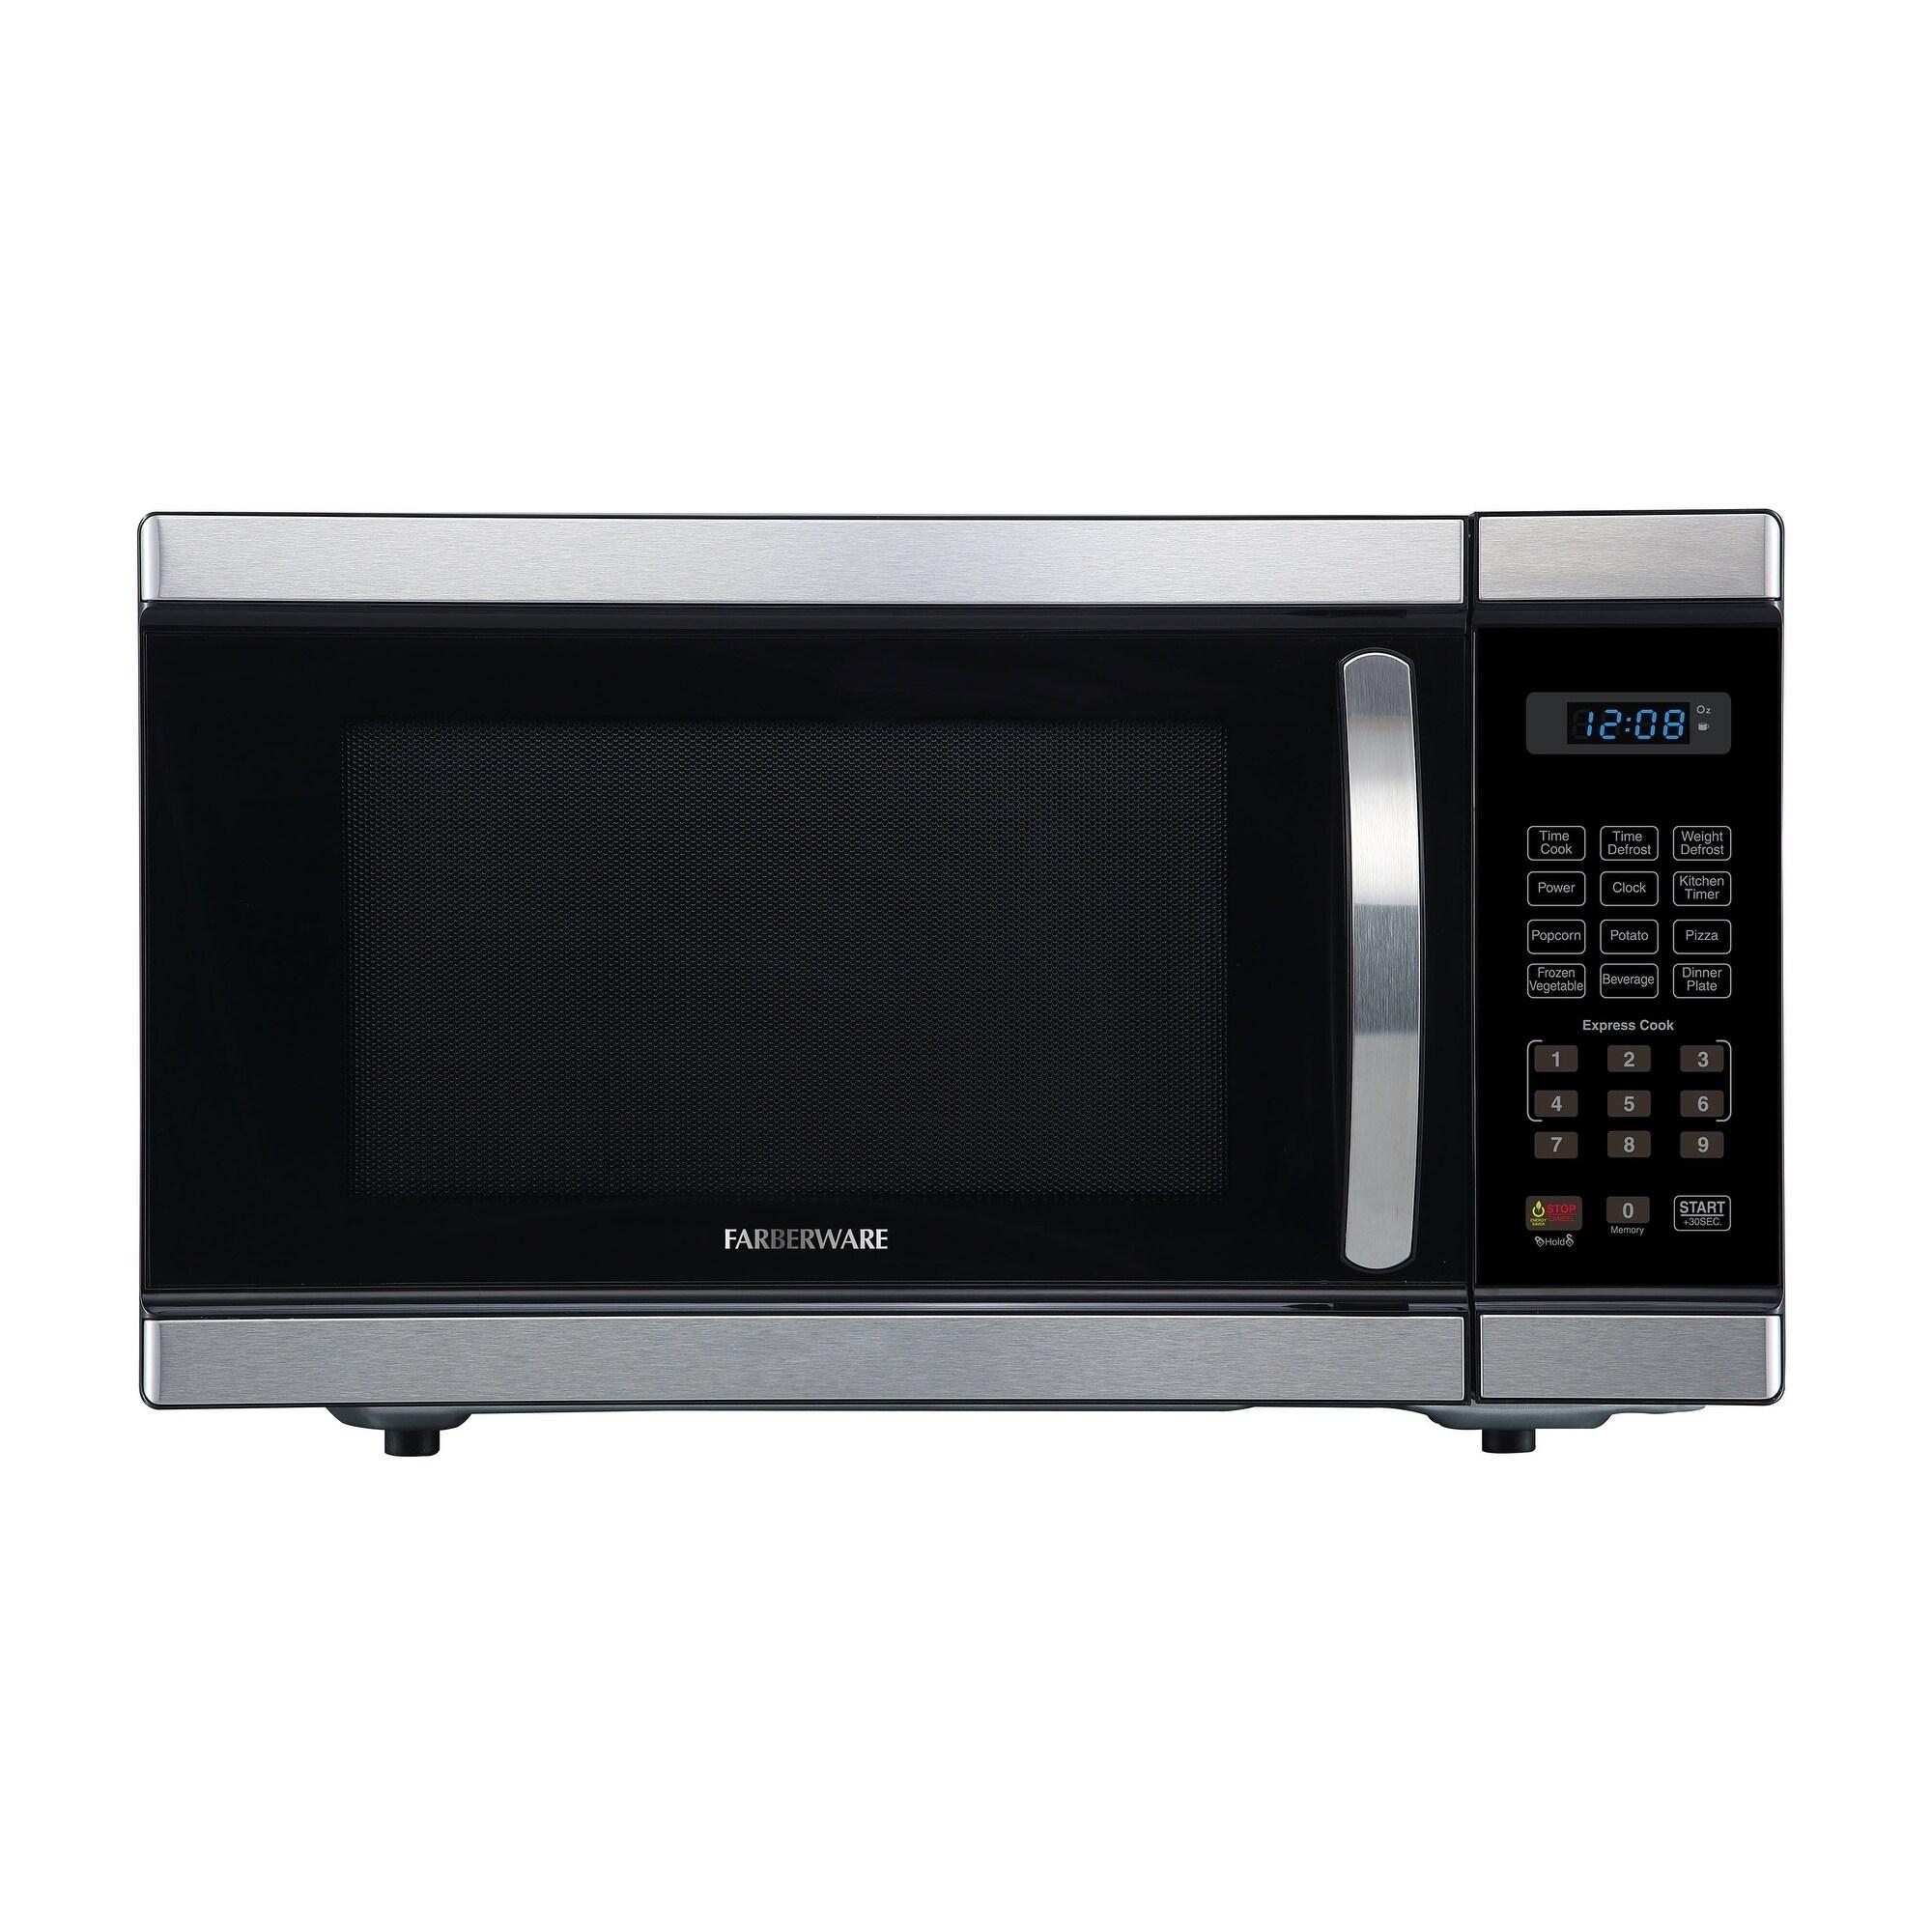 farberware professional fmo11ahtbkl 1 1 cu ft 1000 watt microwave oven stainless steel